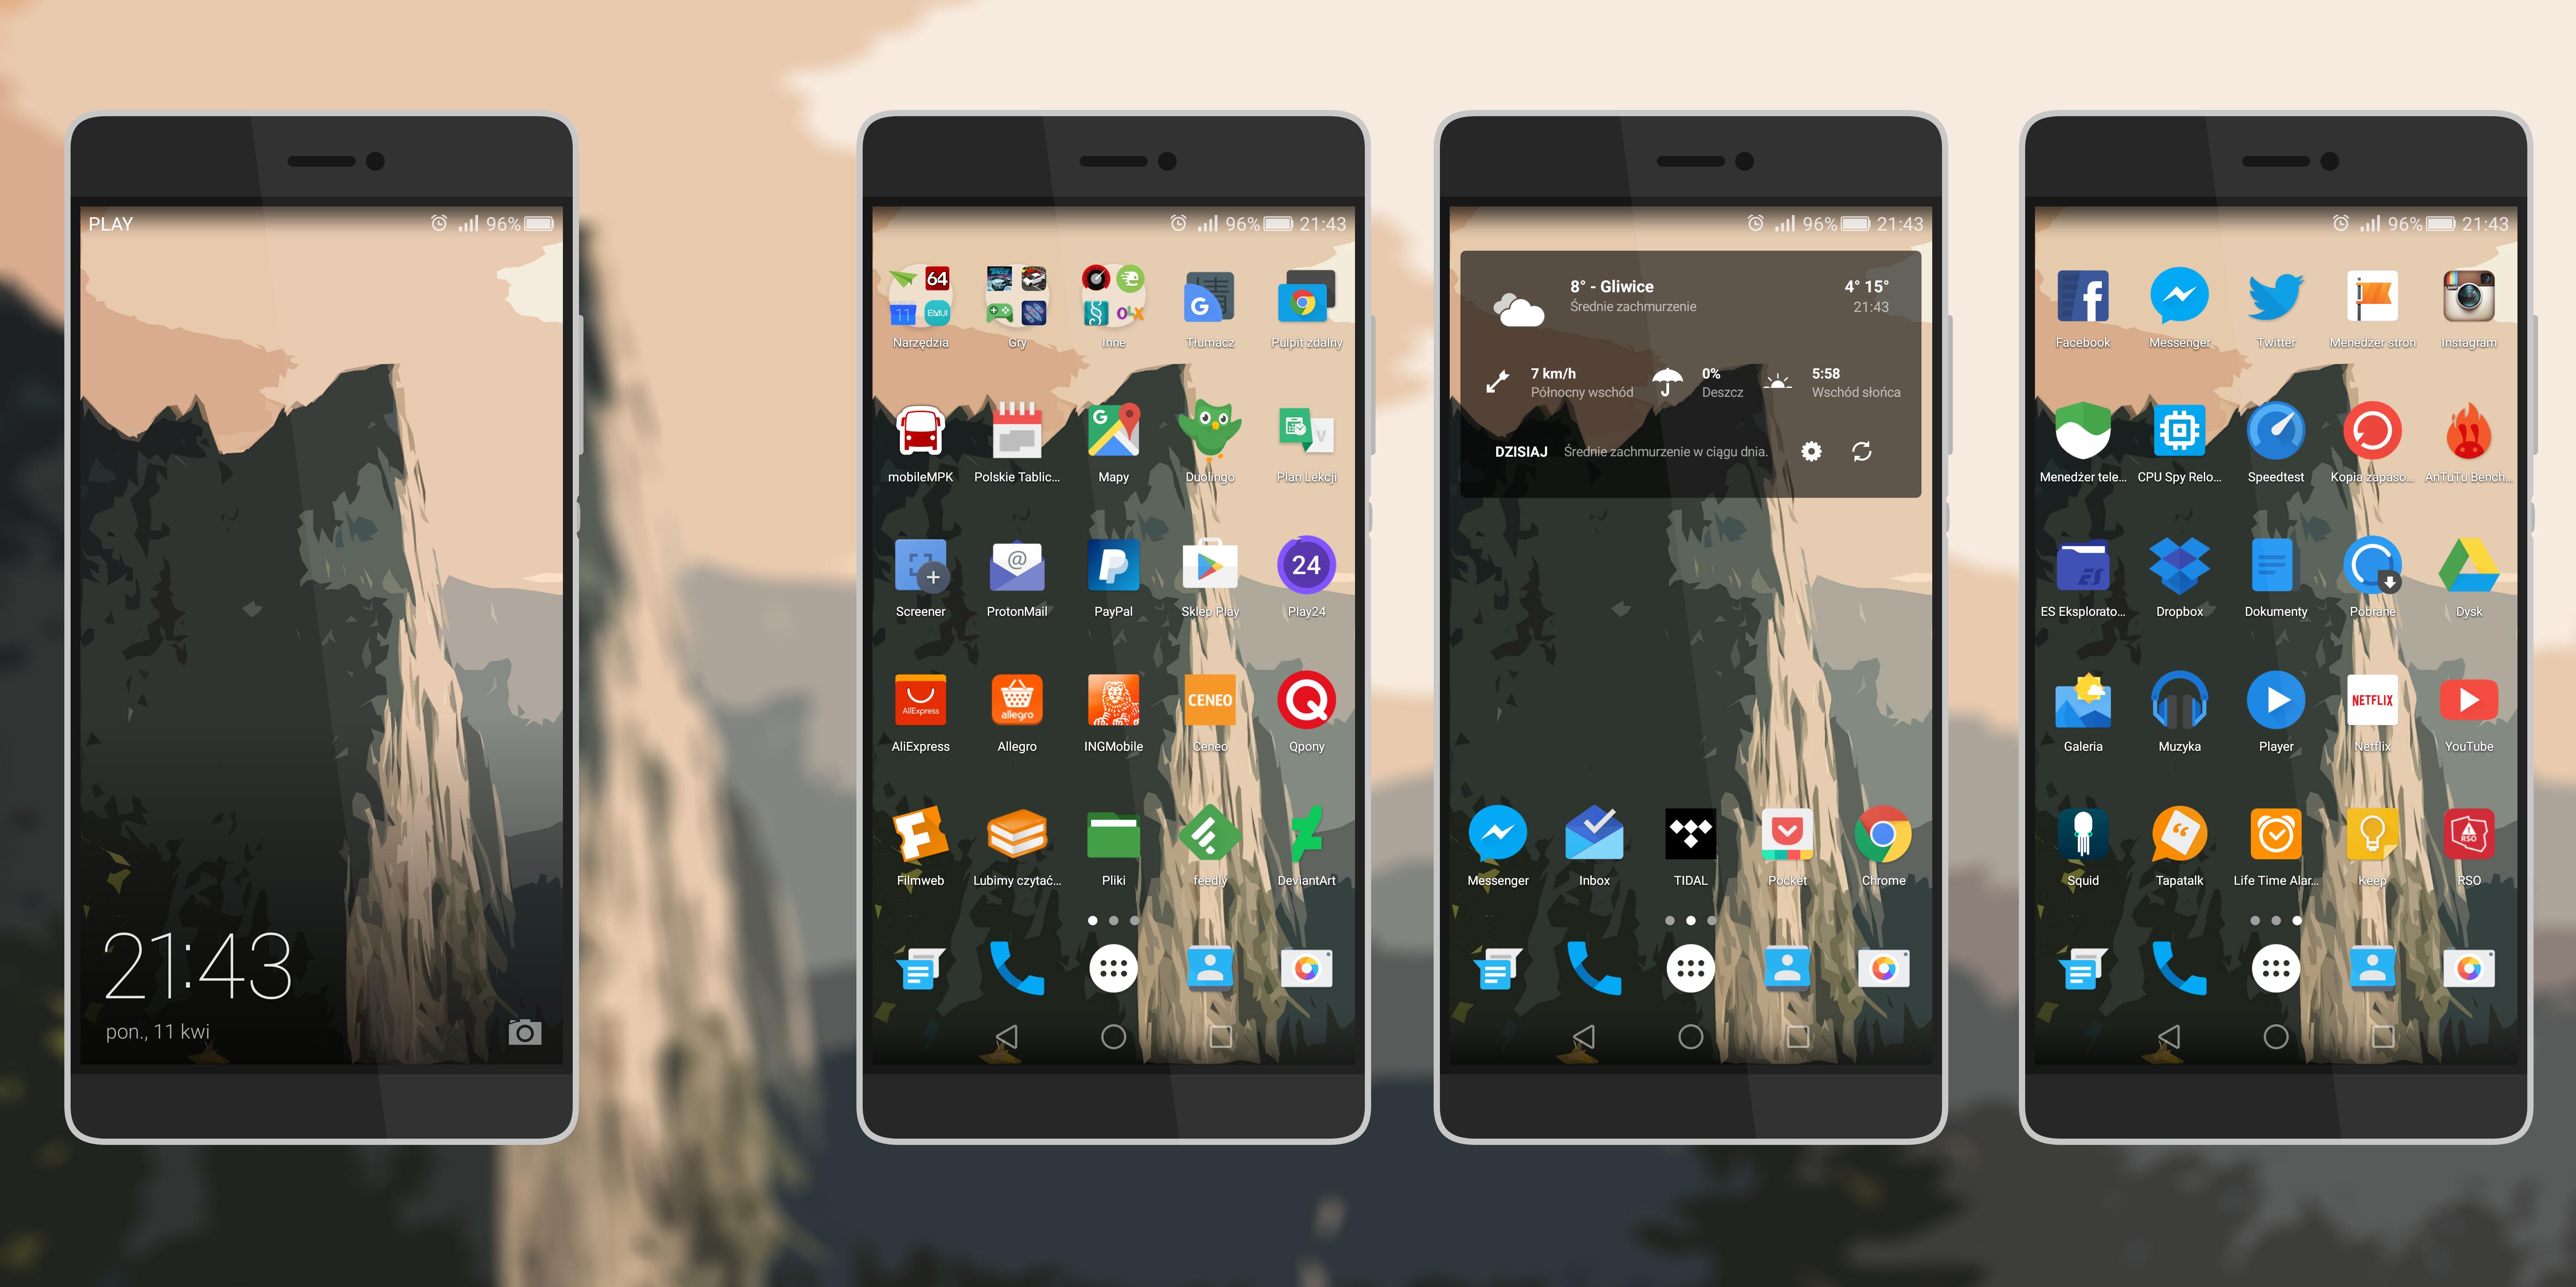 Phone 11 April 2016 Android 51emui 31 By Sebastian456